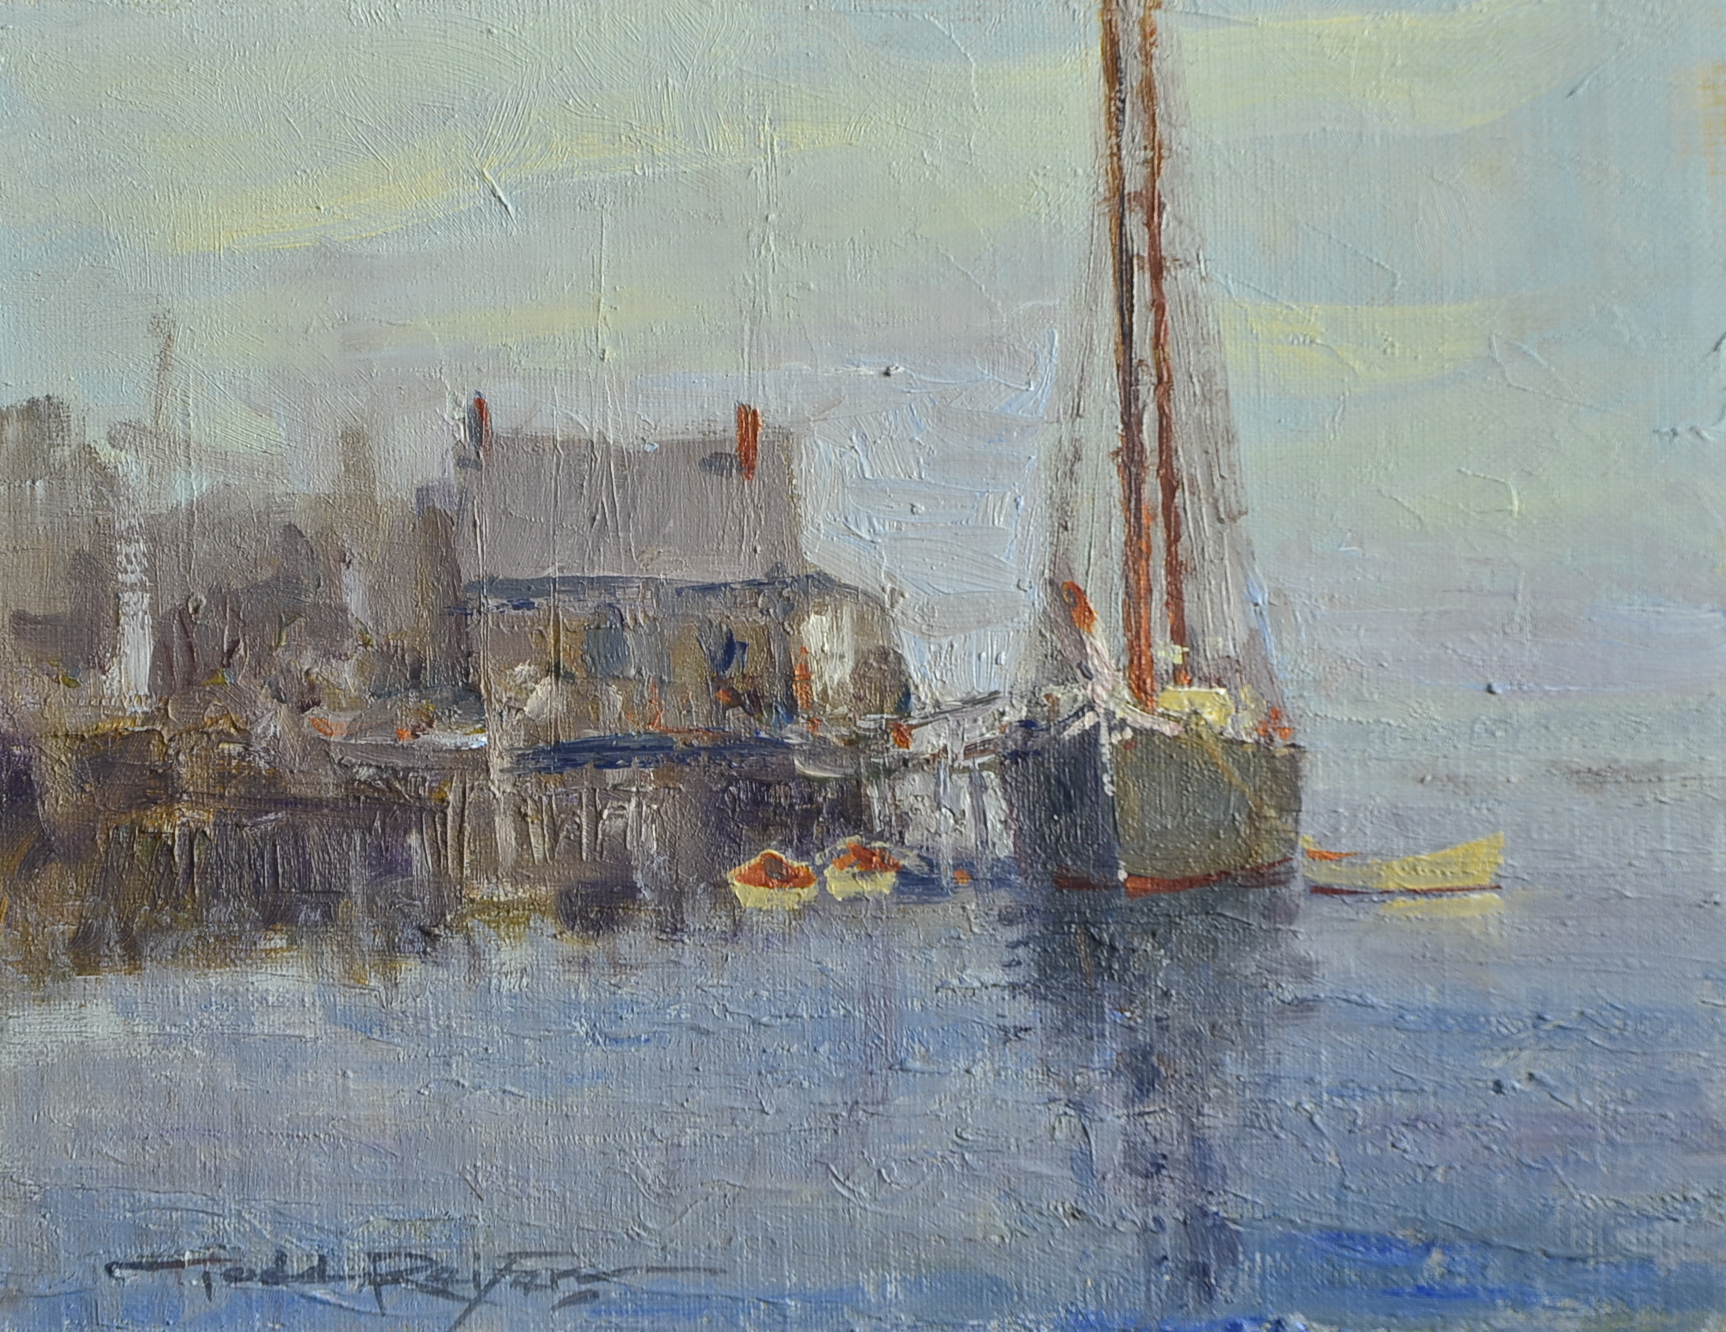 reifers-marinewharfevening-cropped